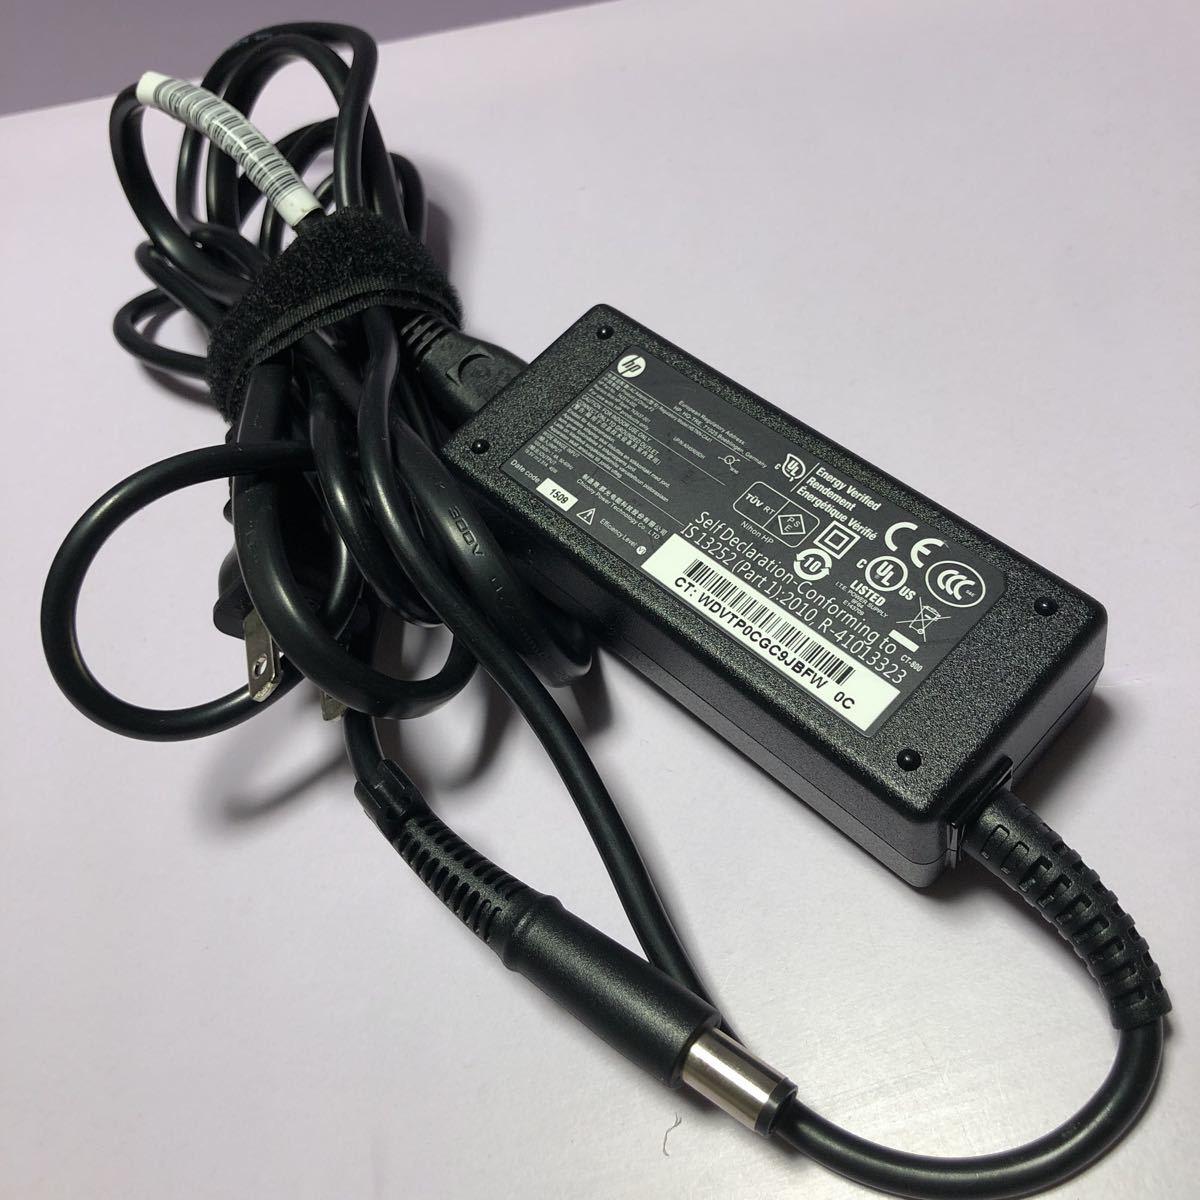 HP 45W AC アダプター HSTNN-CA41 19.5V-2.31A EliteBook 820 840G1/CT Folio 9470m ProBook 430 G1/450 G2など対応動作品管理番号SHA187